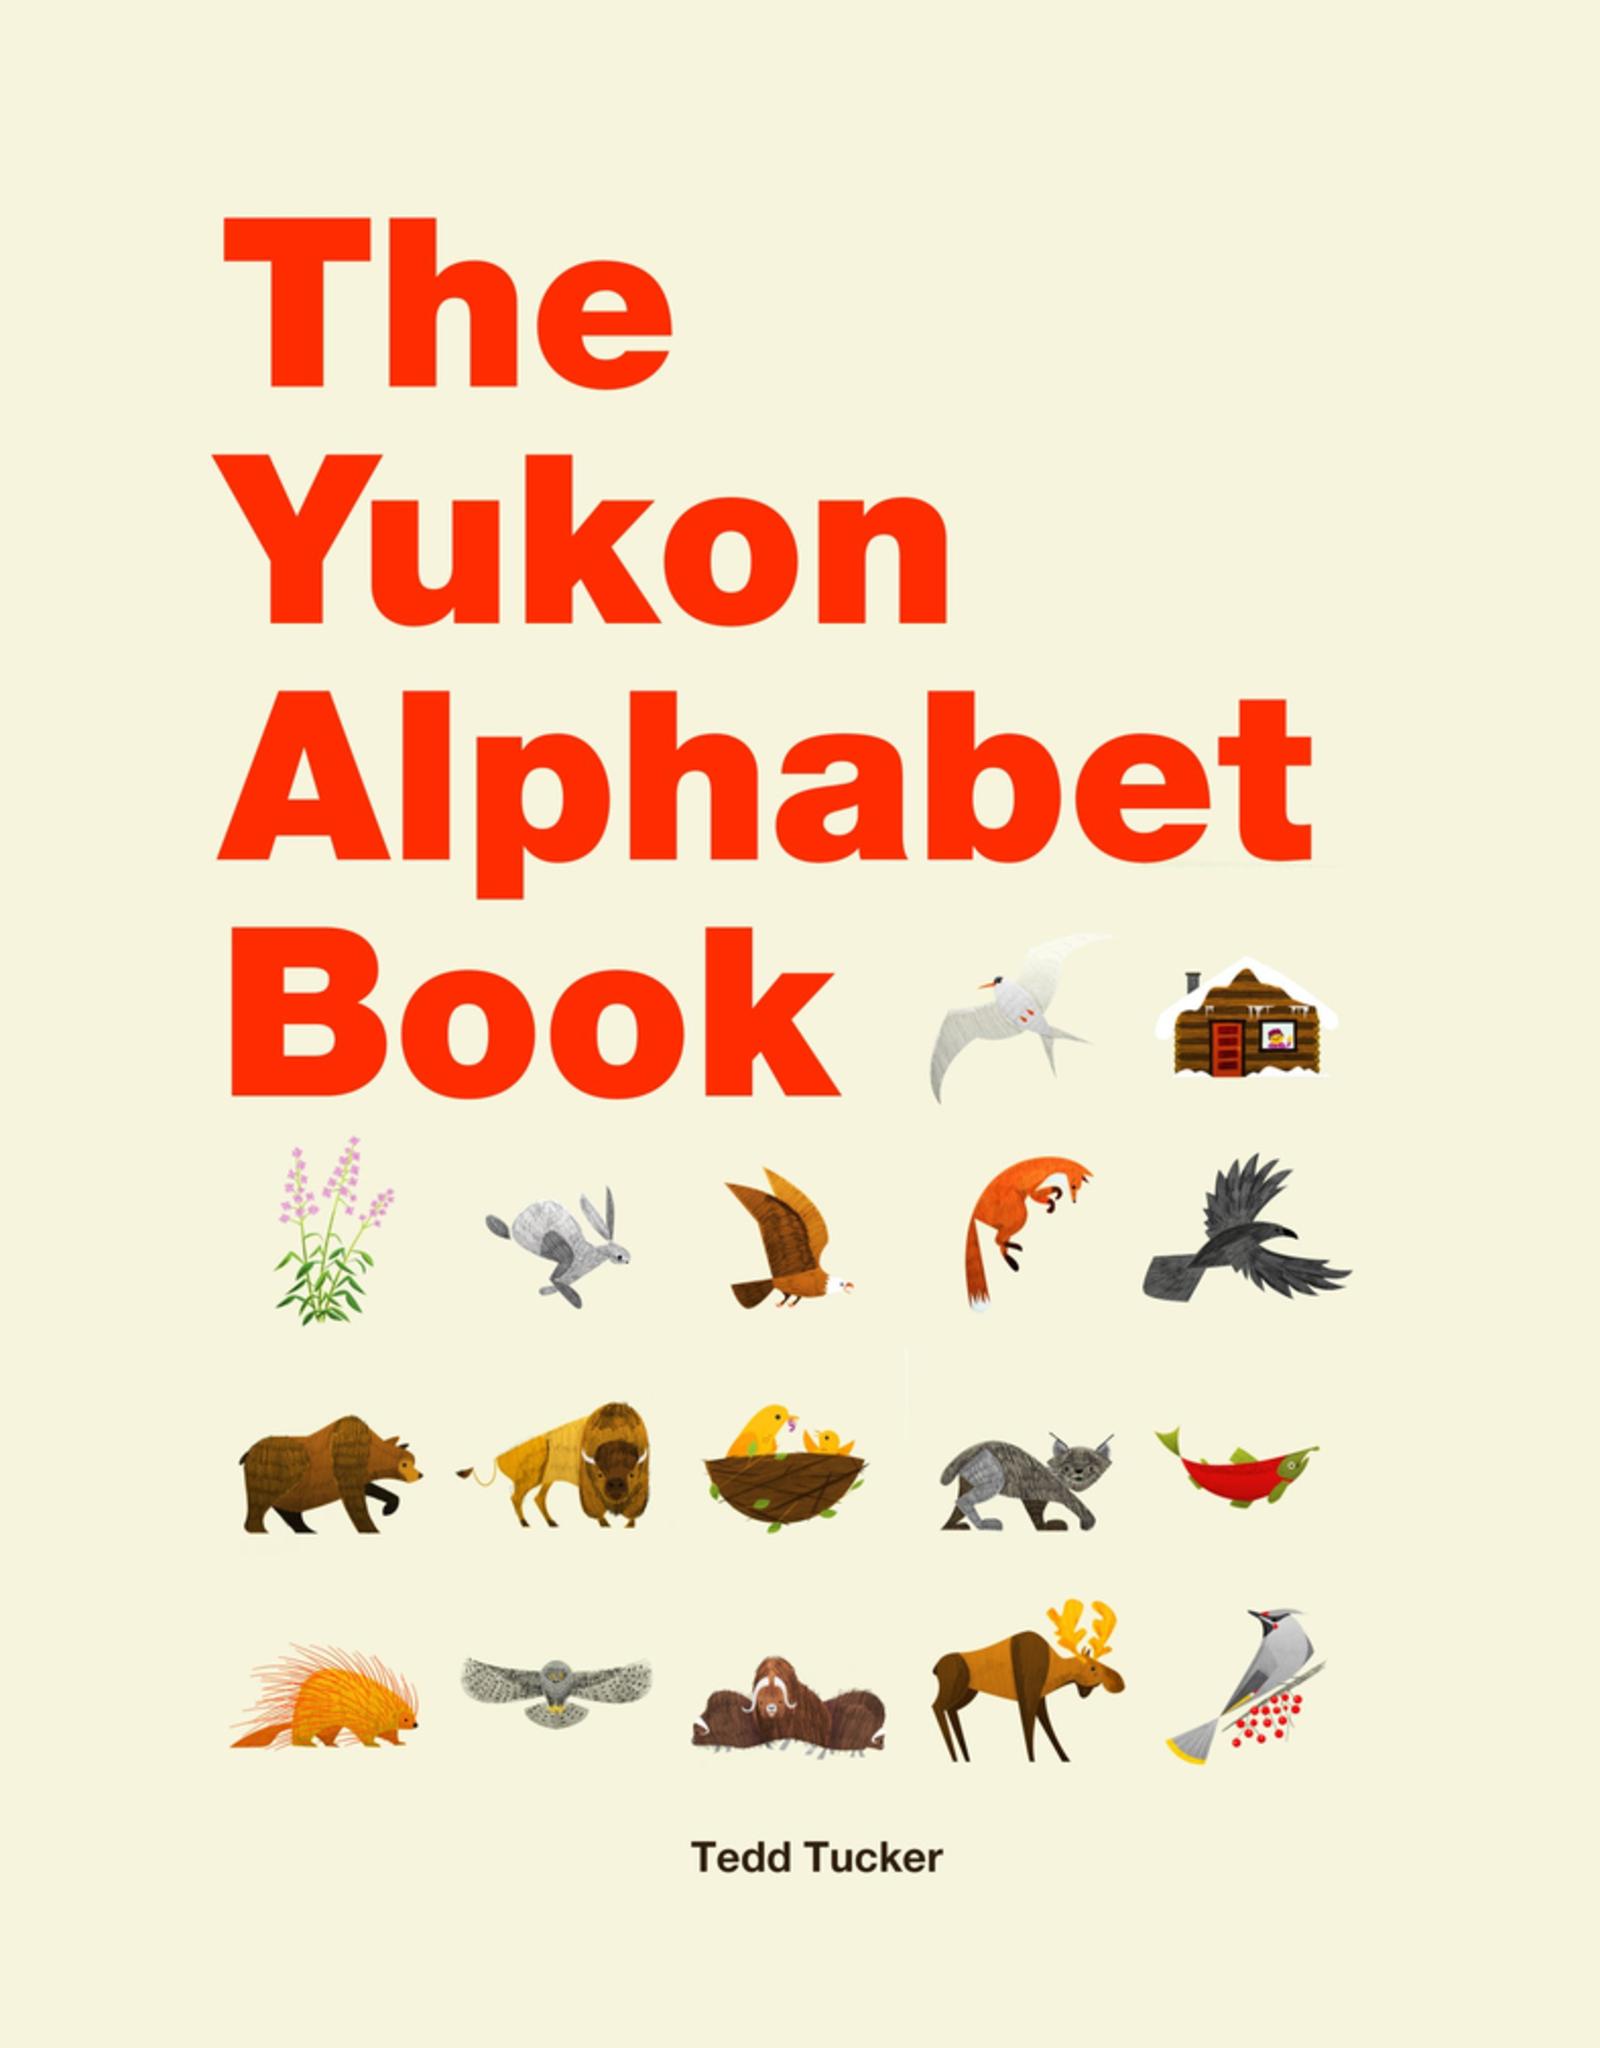 Tedd Tucker Alphabet Book